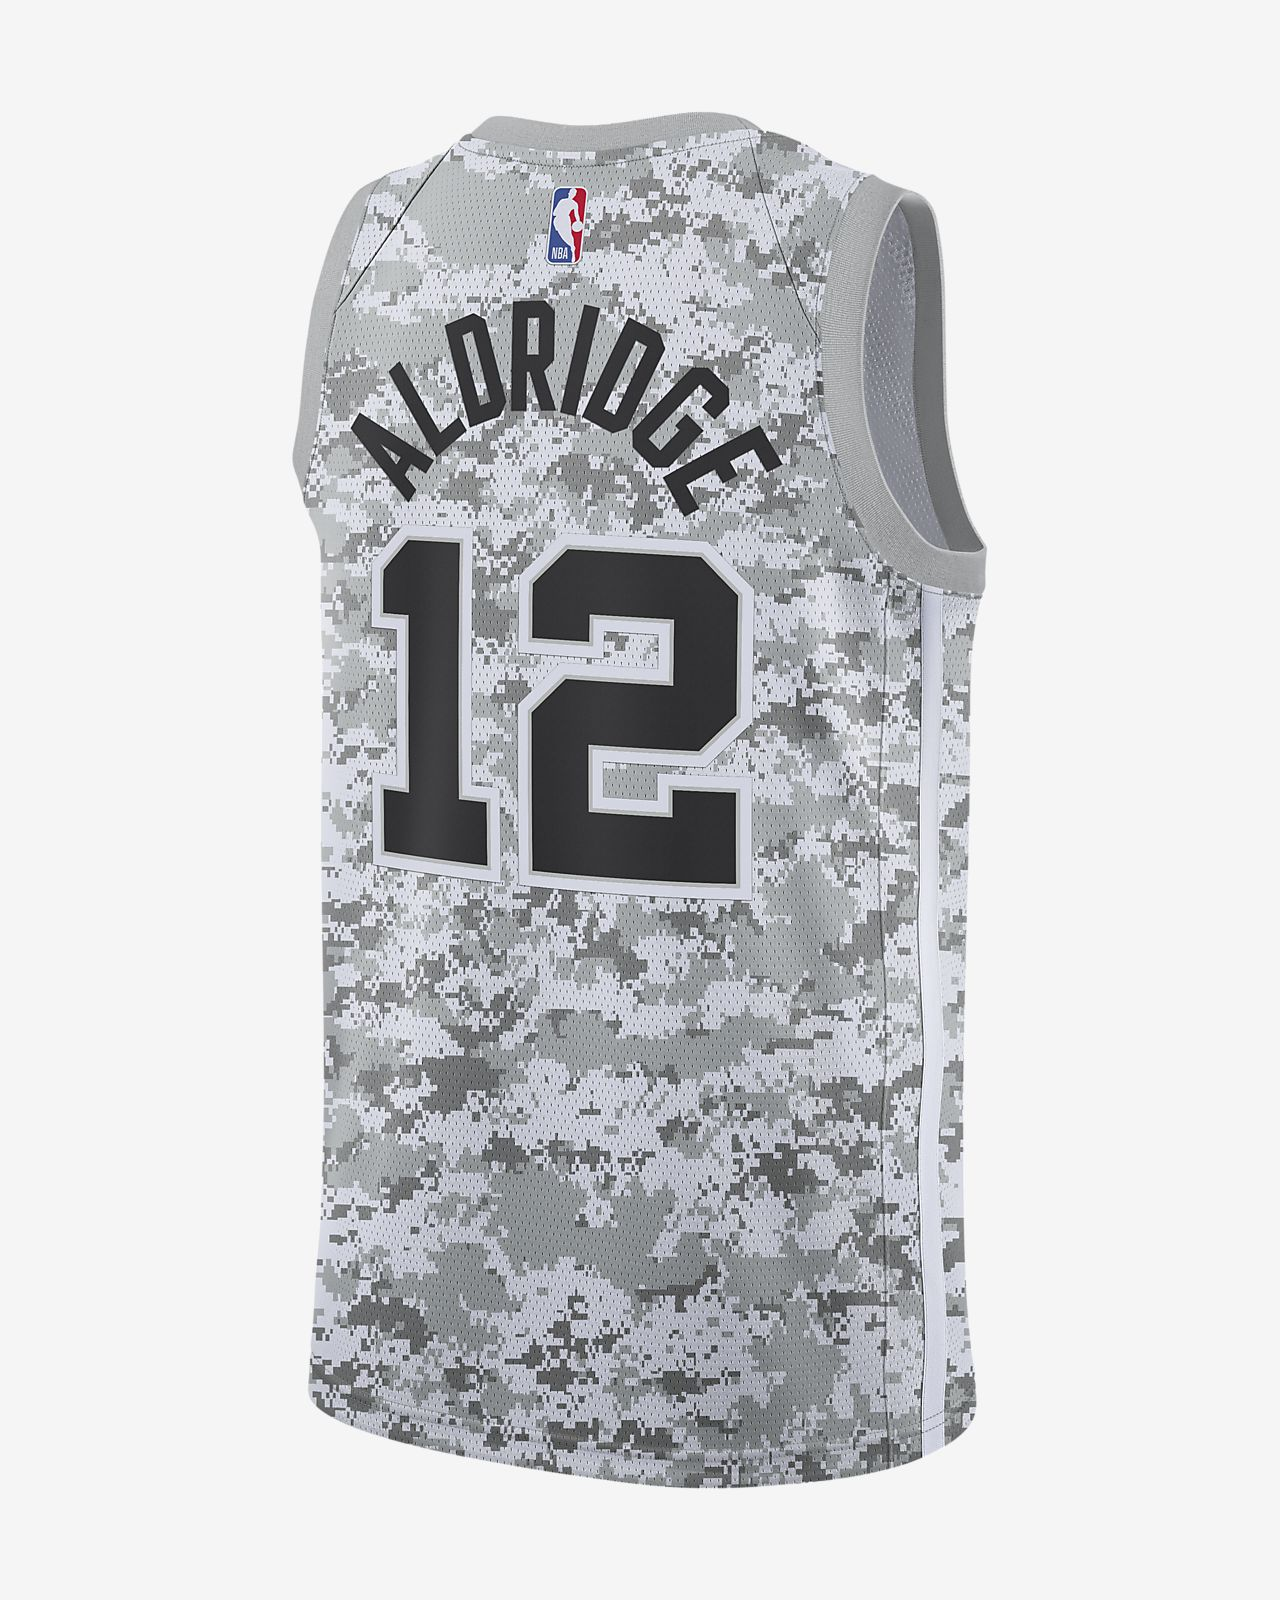 02455e851b42 ... LaMarcus Aldridge Earned City Edition Swingman (San Antonio Spurs) Men s  Nike NBA Connected Jersey